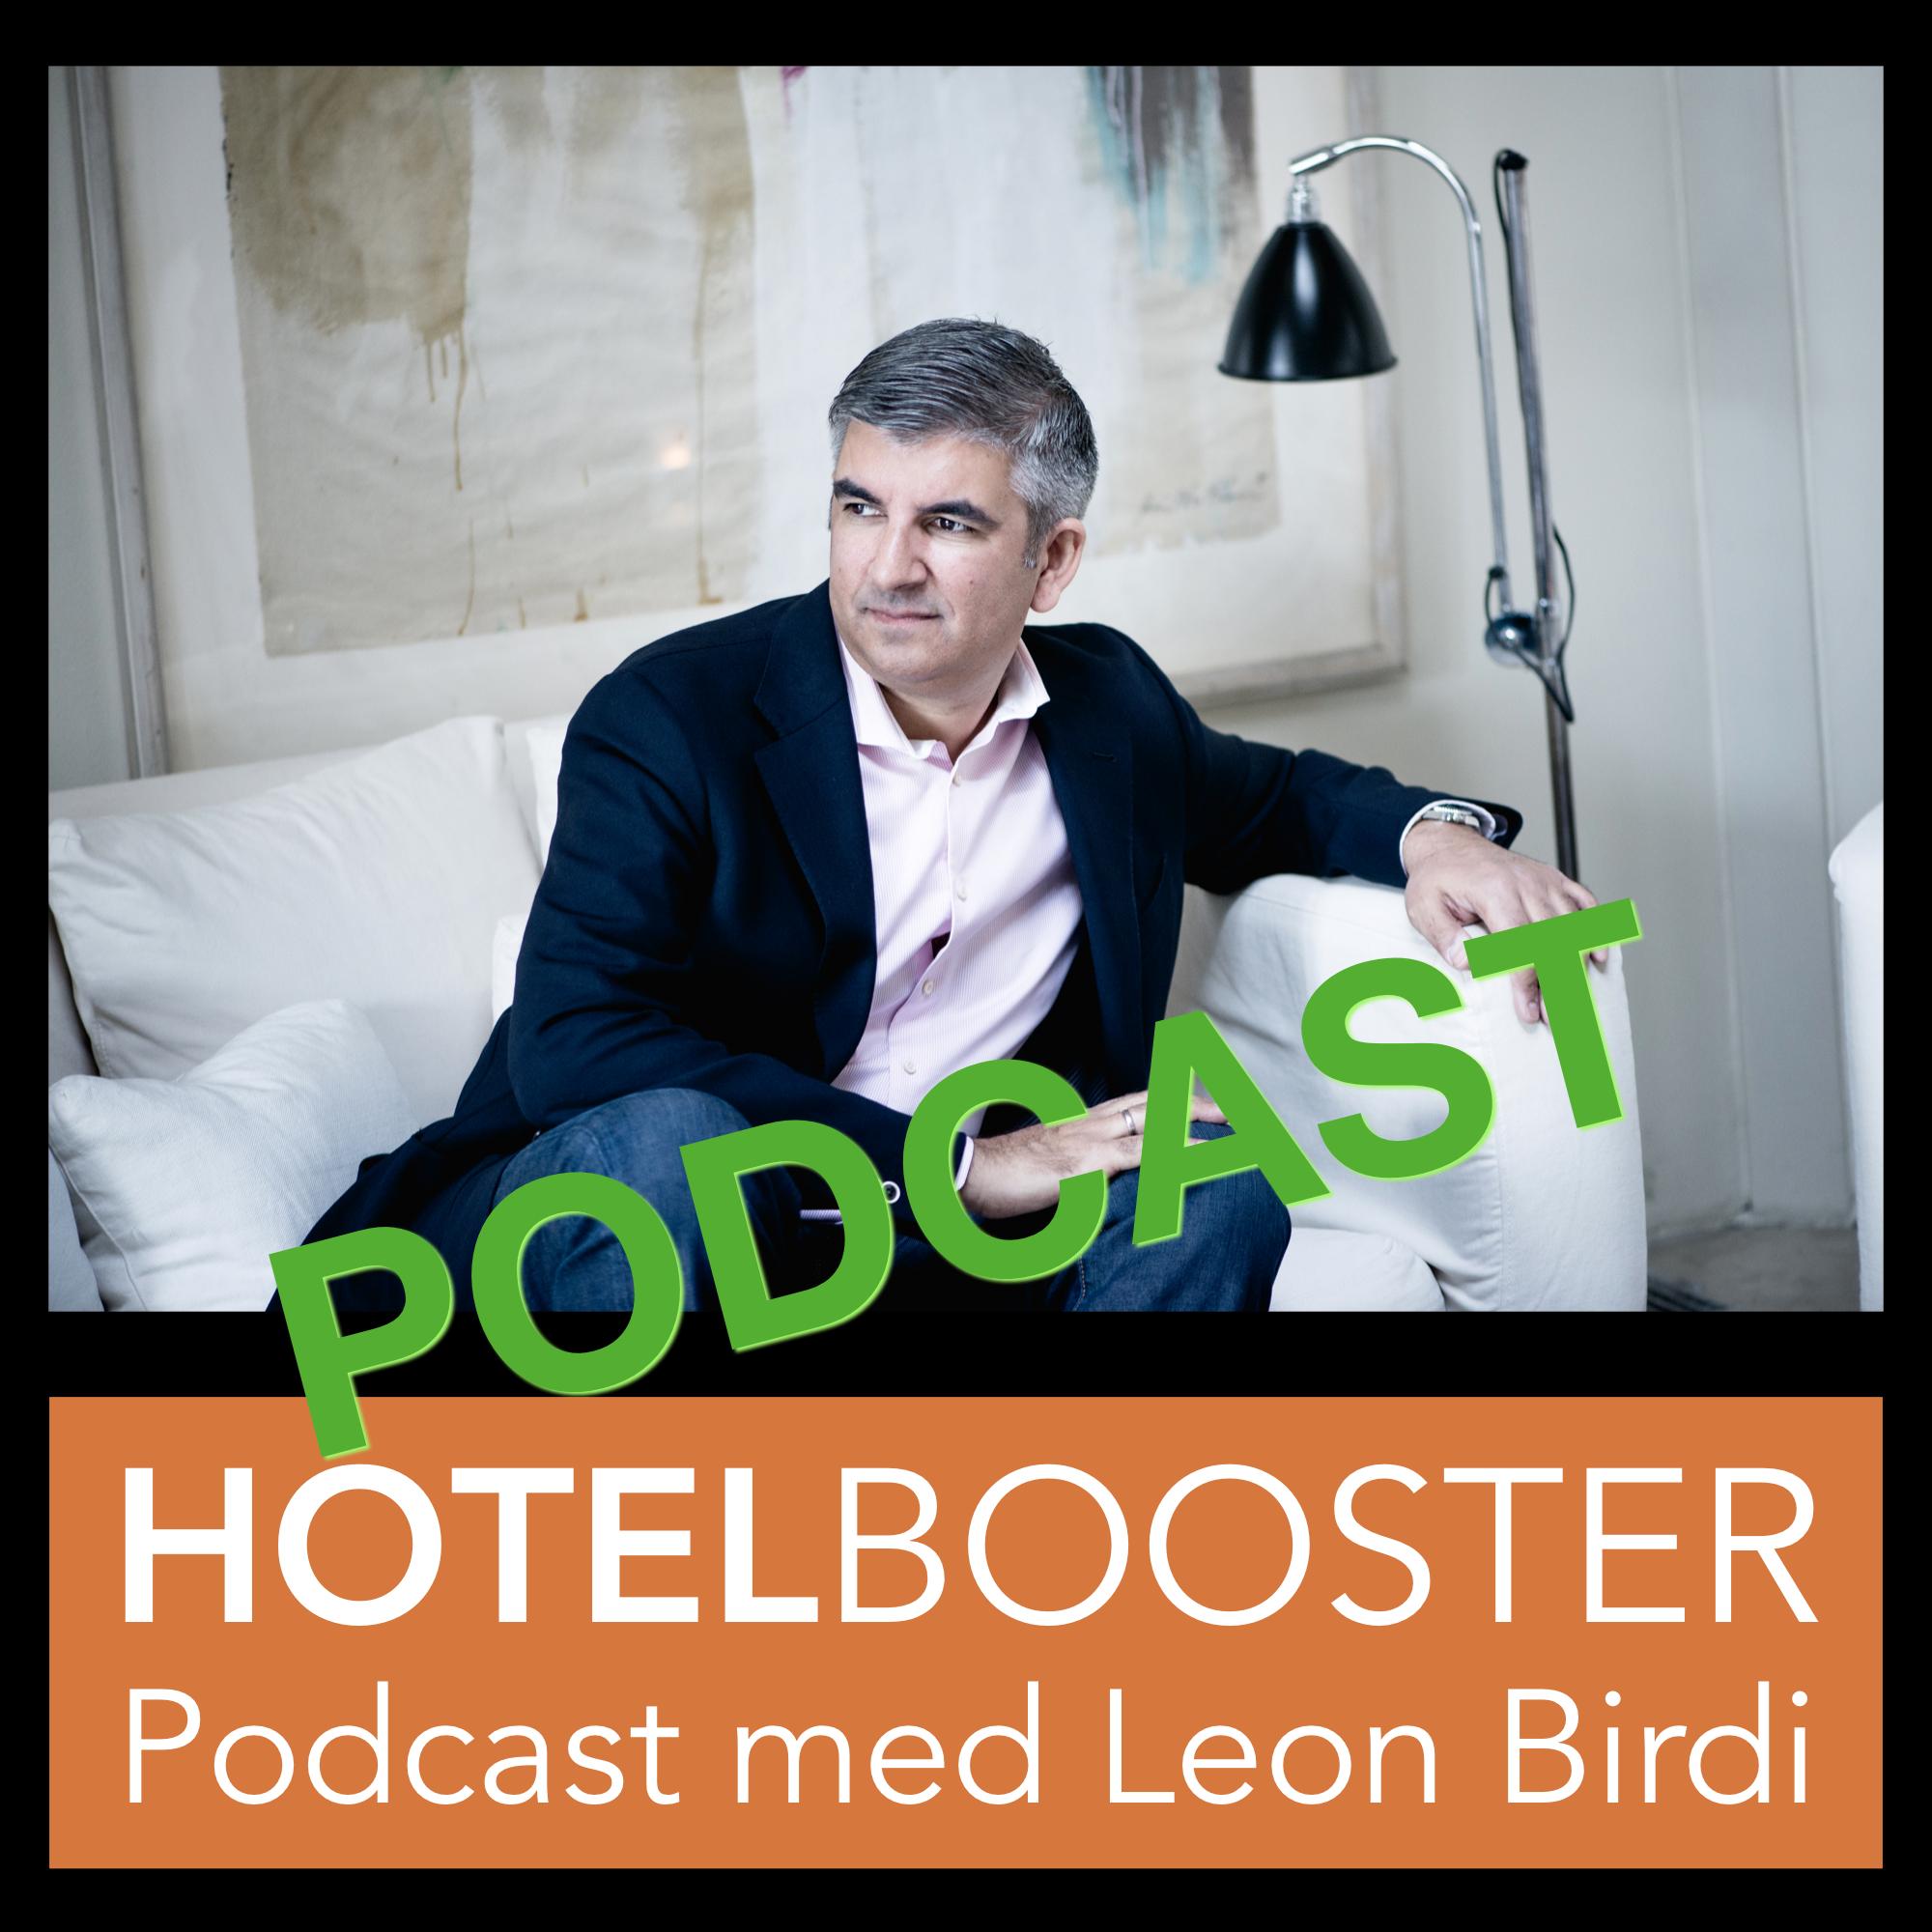 Hotelbooster Podcast med Leon Birdi show art